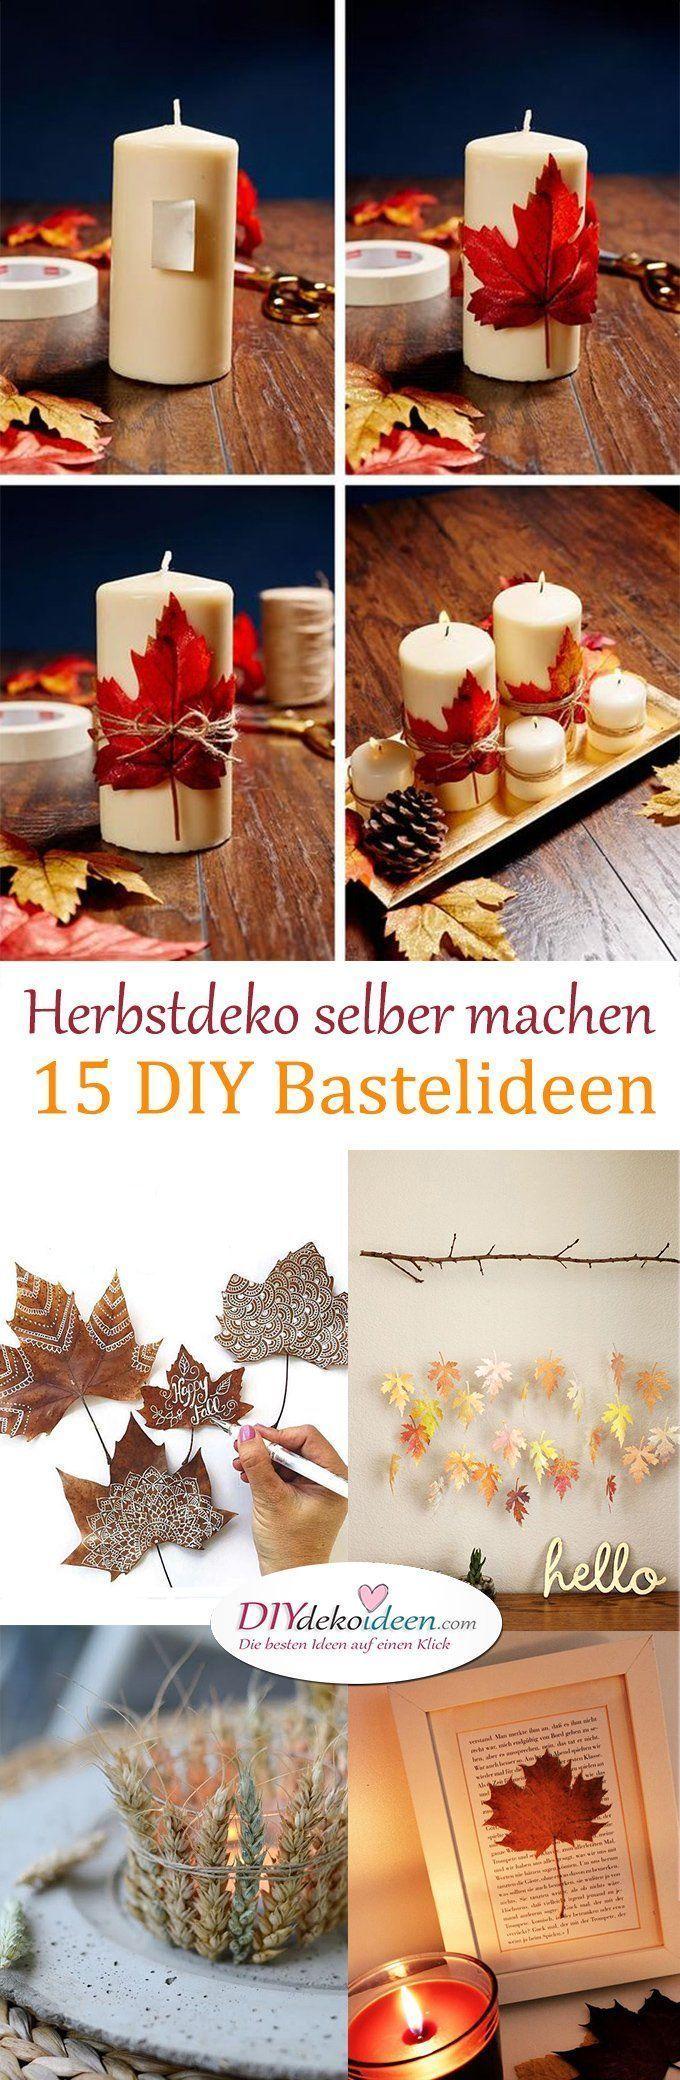 Herbstdekoration selber machen – 15 Bastelideen …